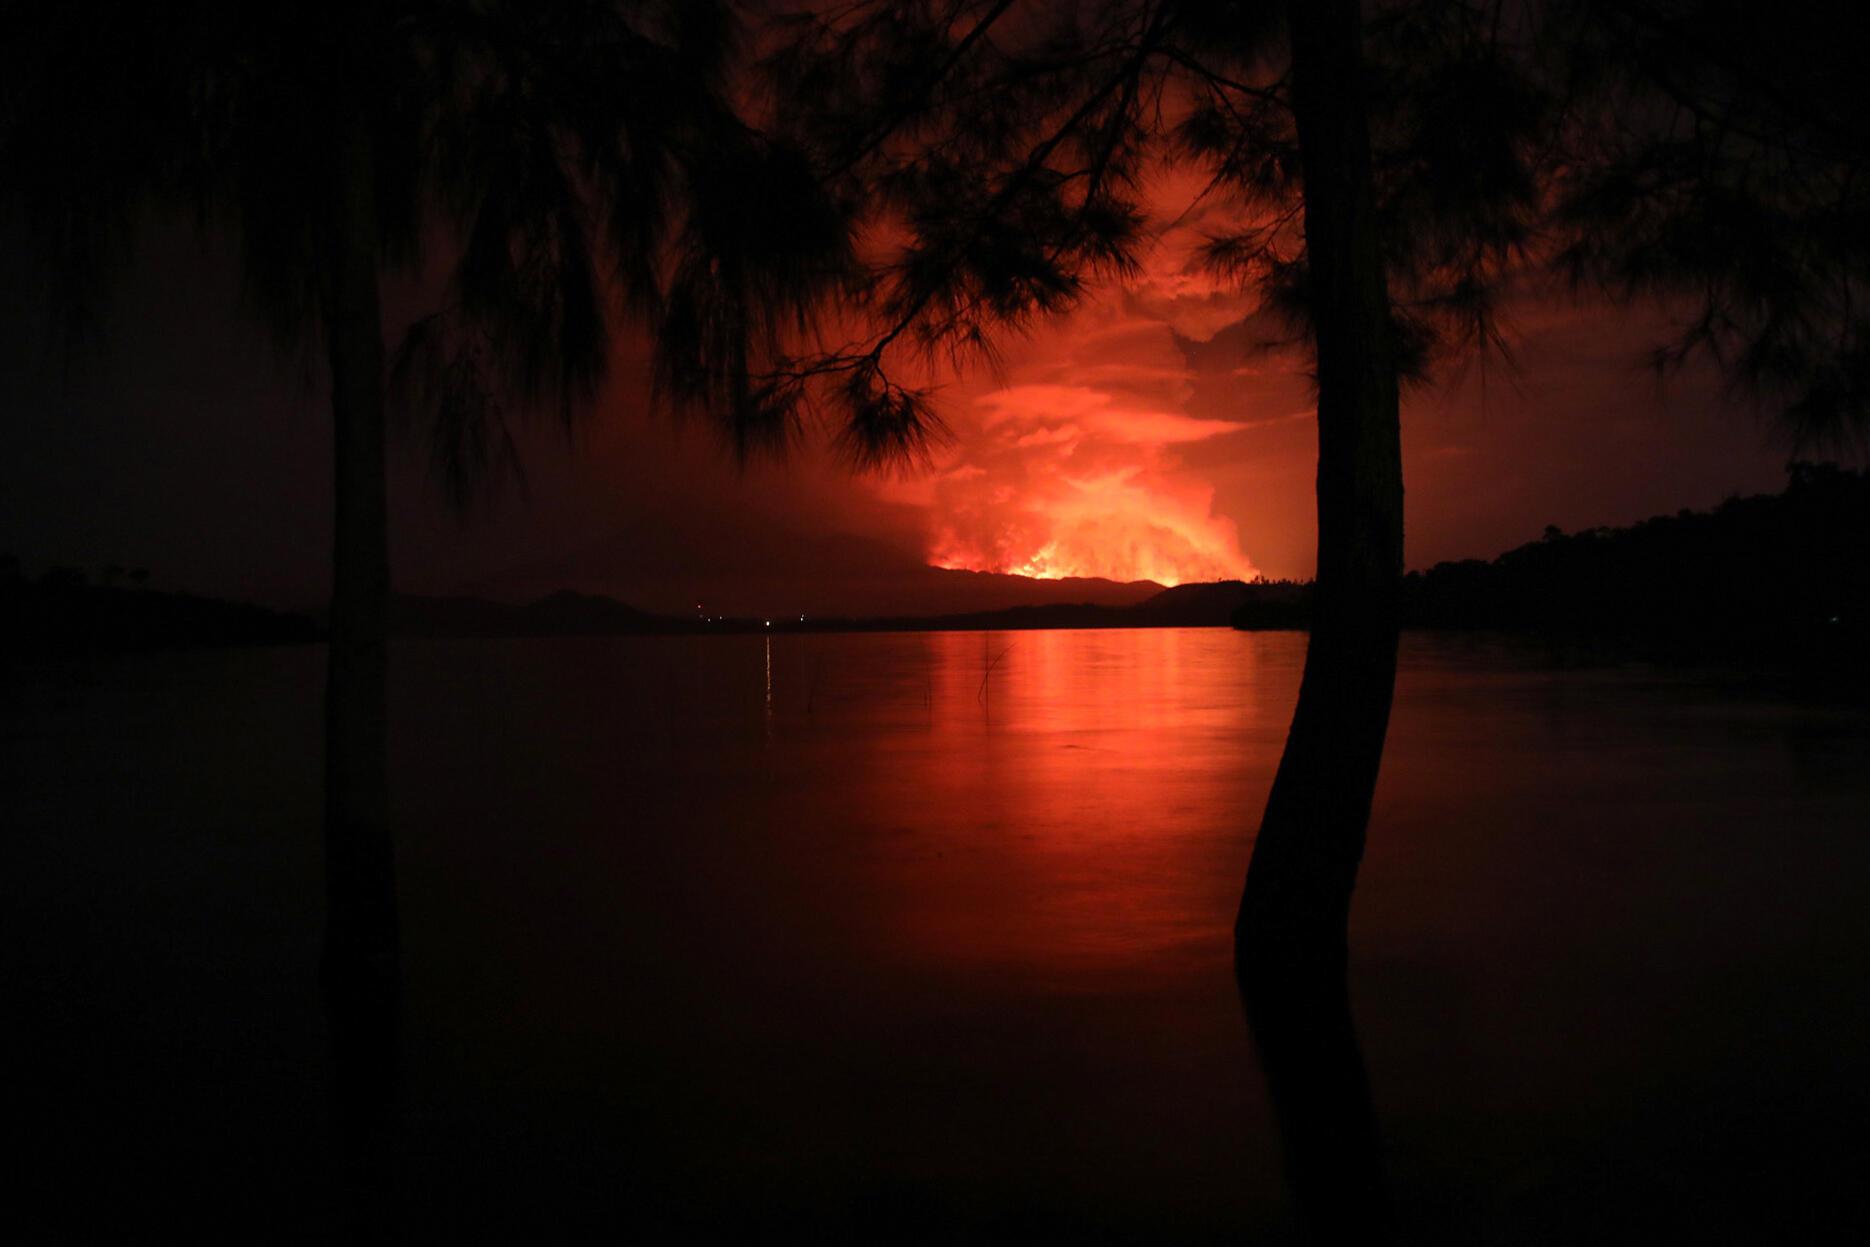 Le volcan Nyiragongo en éruption vu depuis le lac Kivu.